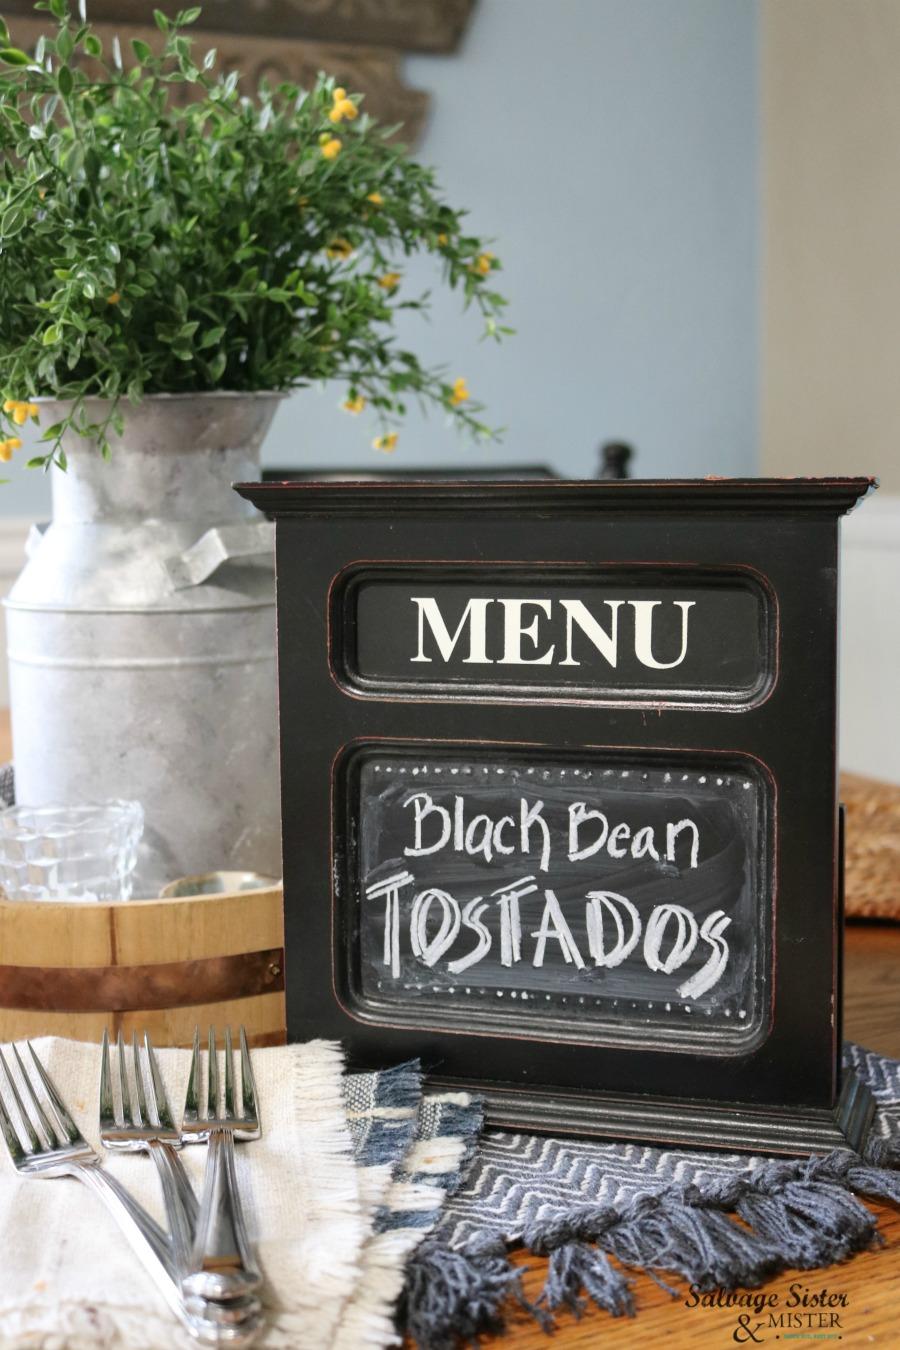 menu chalkboard found while thrifting. Get beginner chalkboard lettering tips on salvagesisterandmister.com